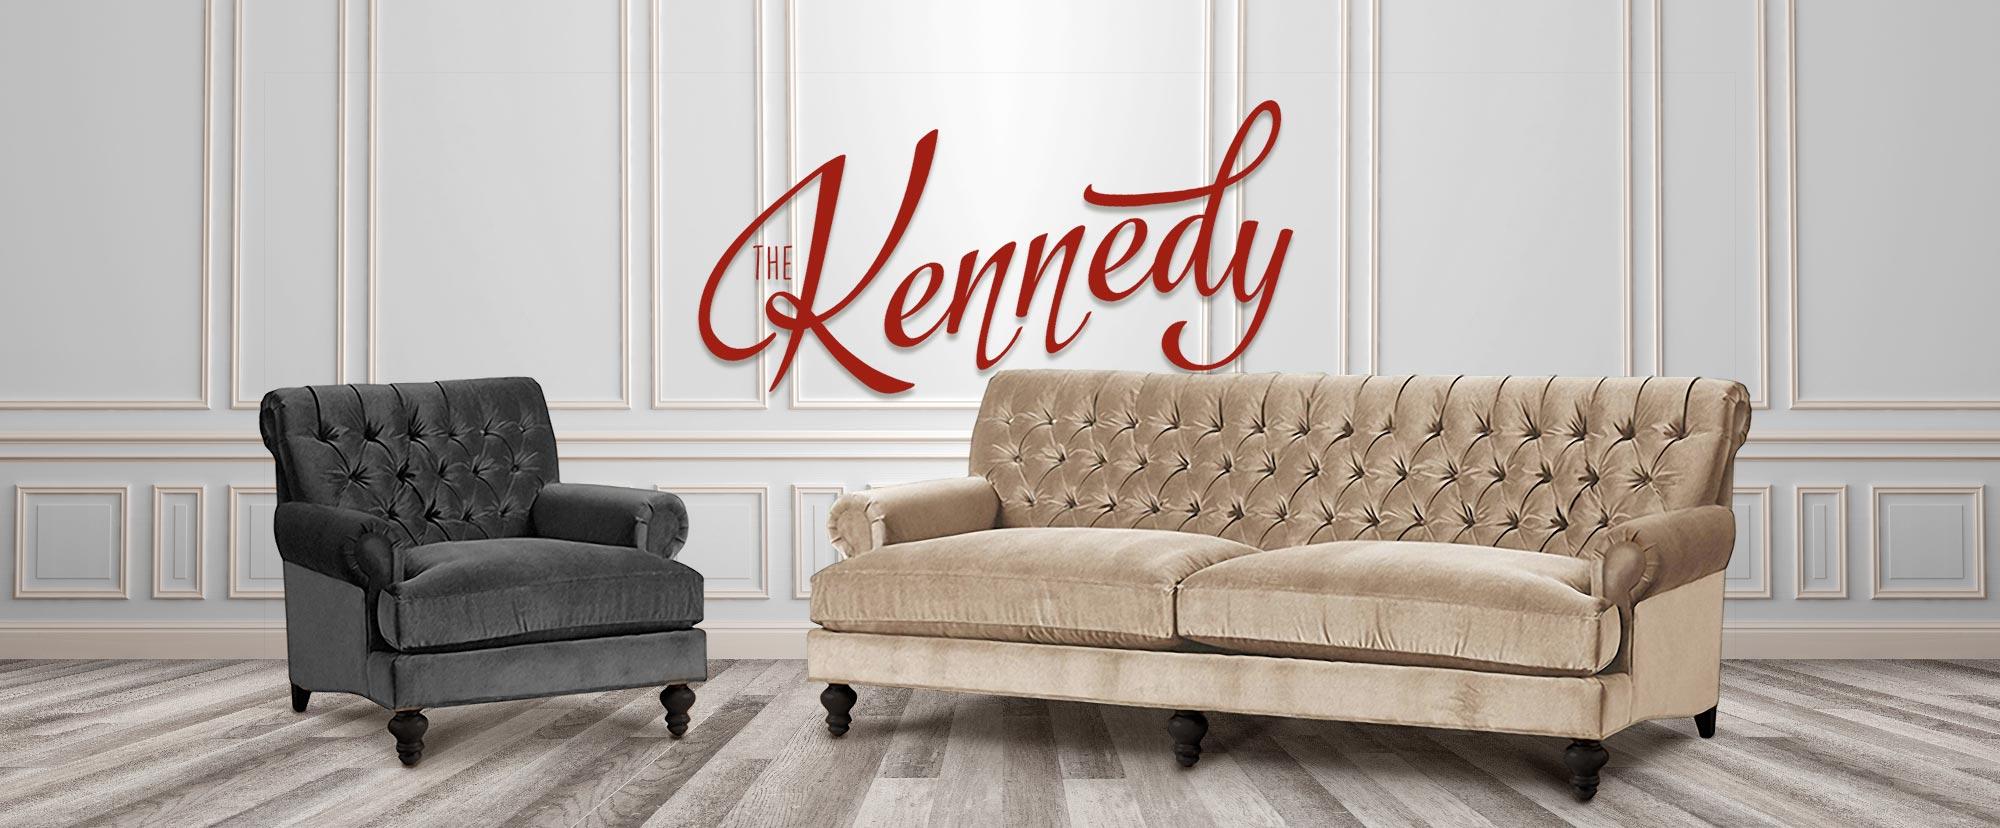 Kennedy_SuperWide_Ver2